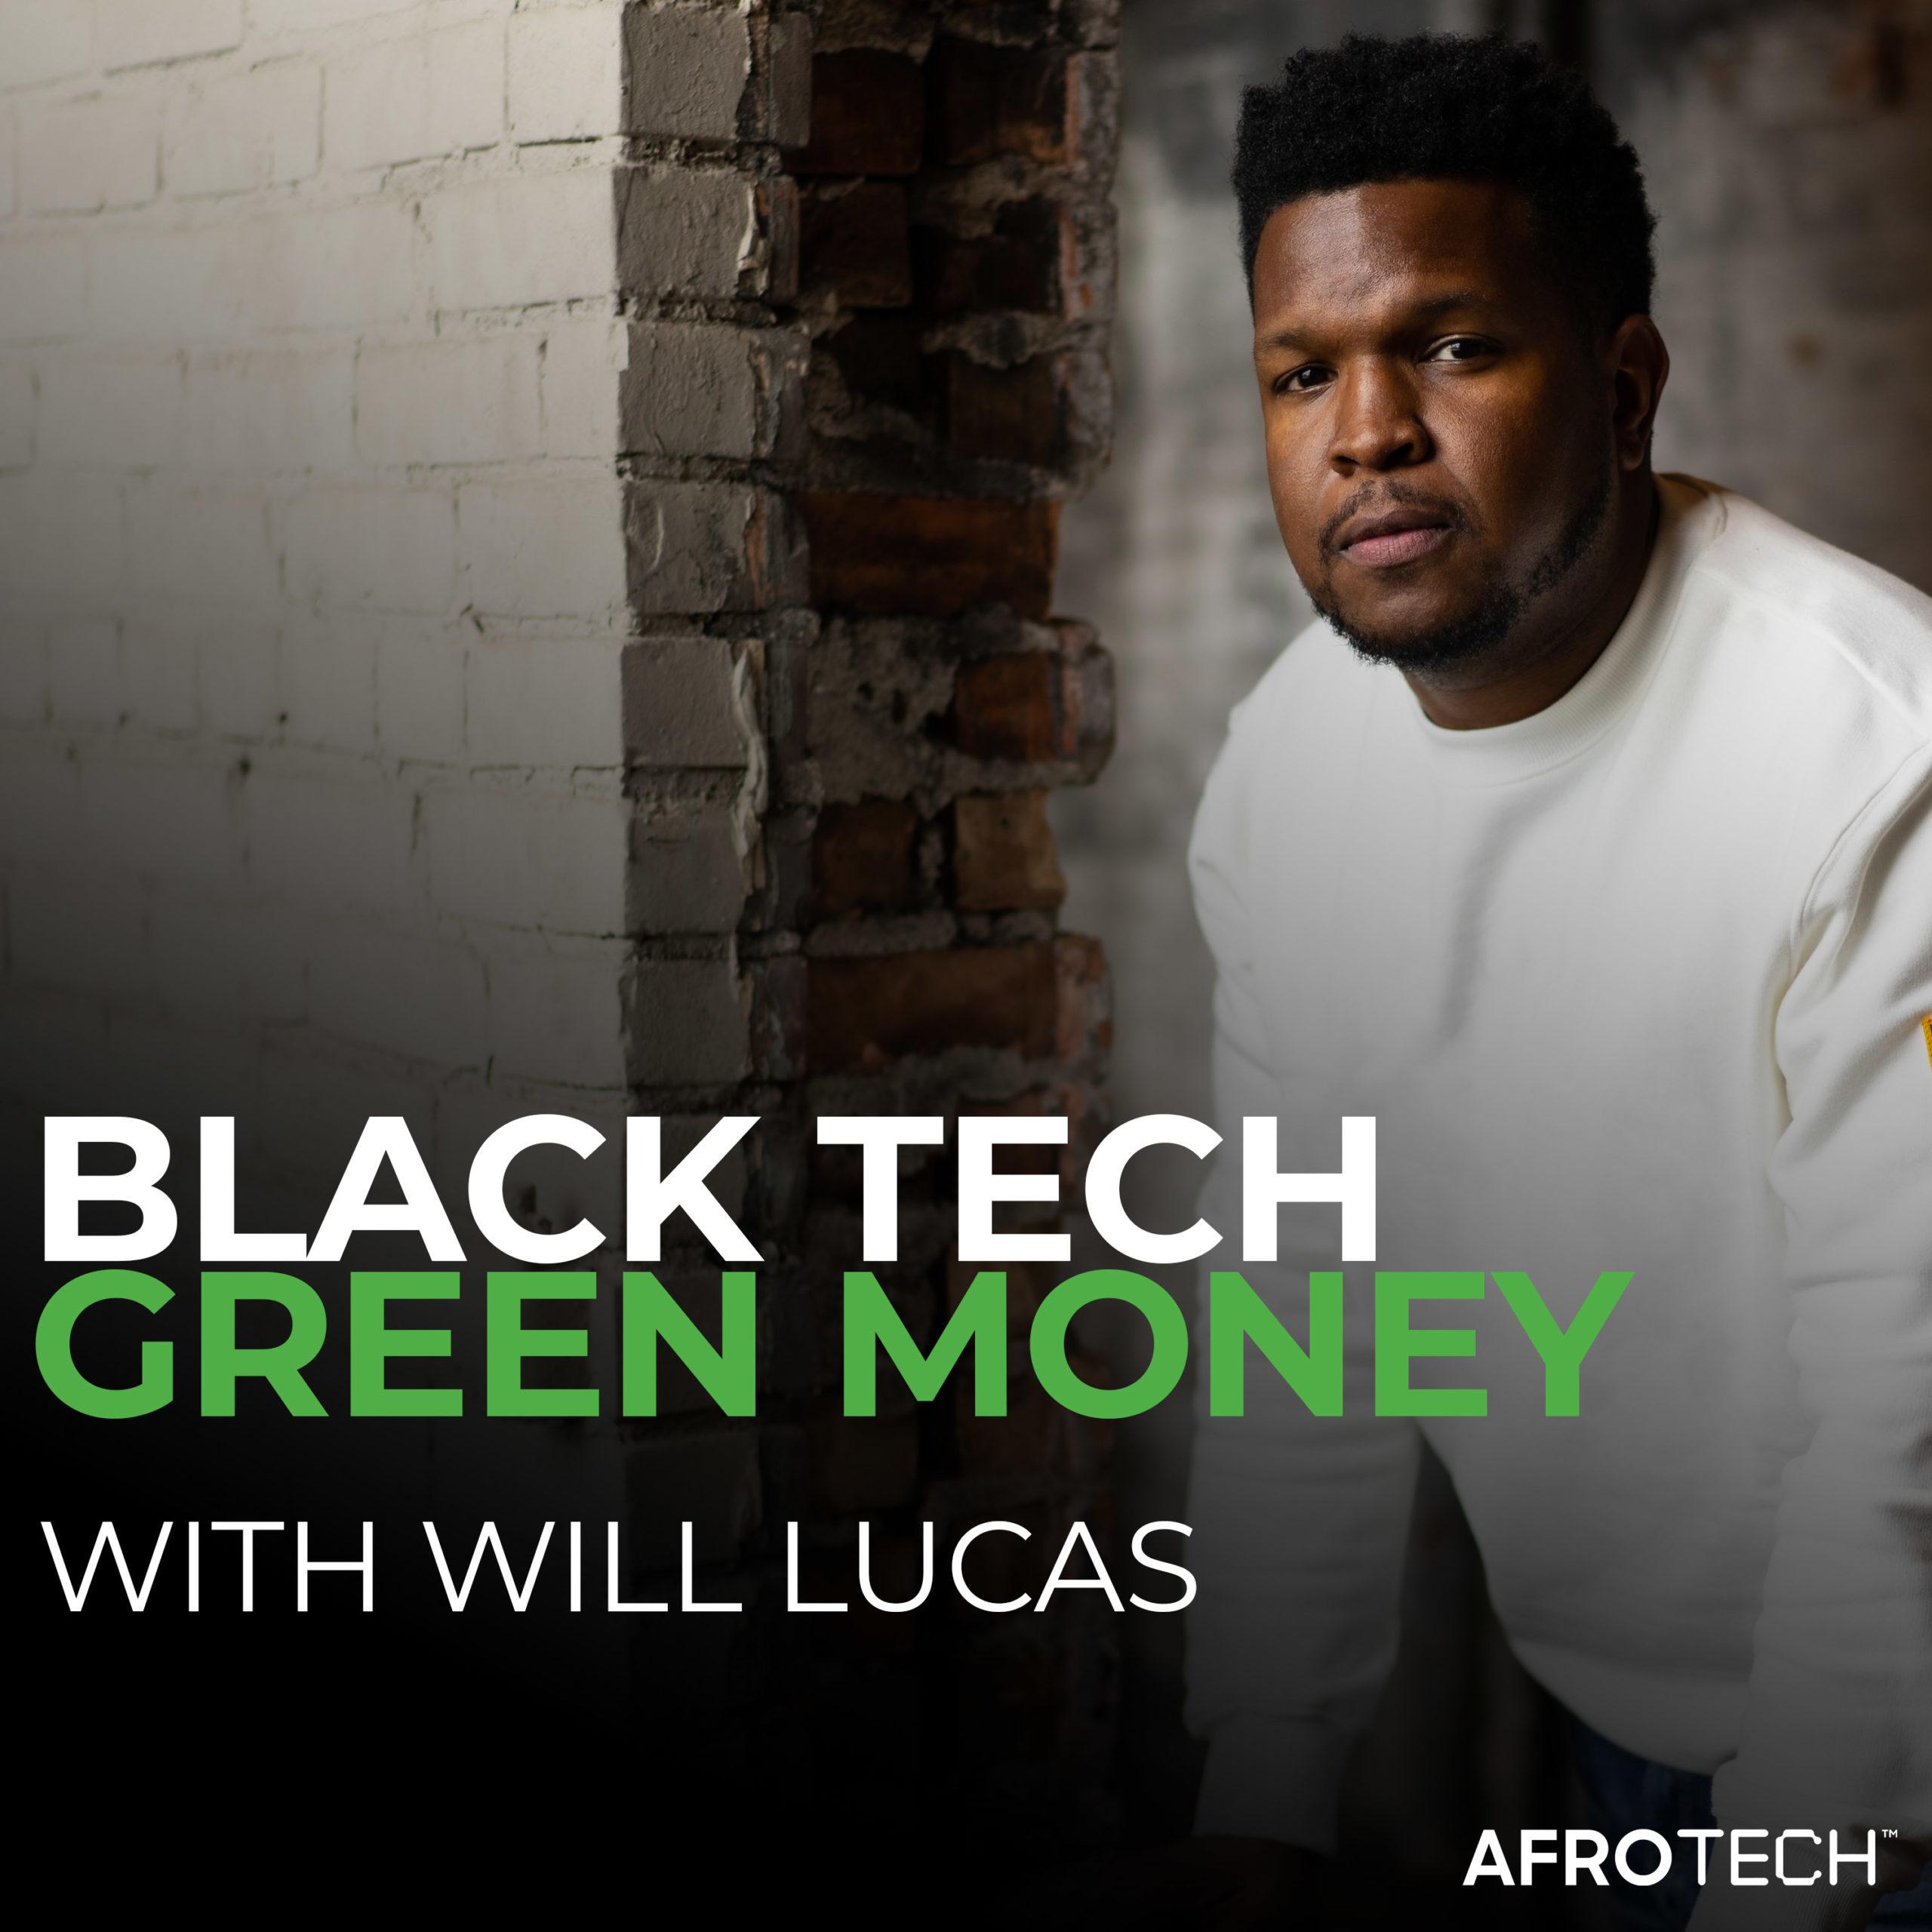 Black Tech Green Money